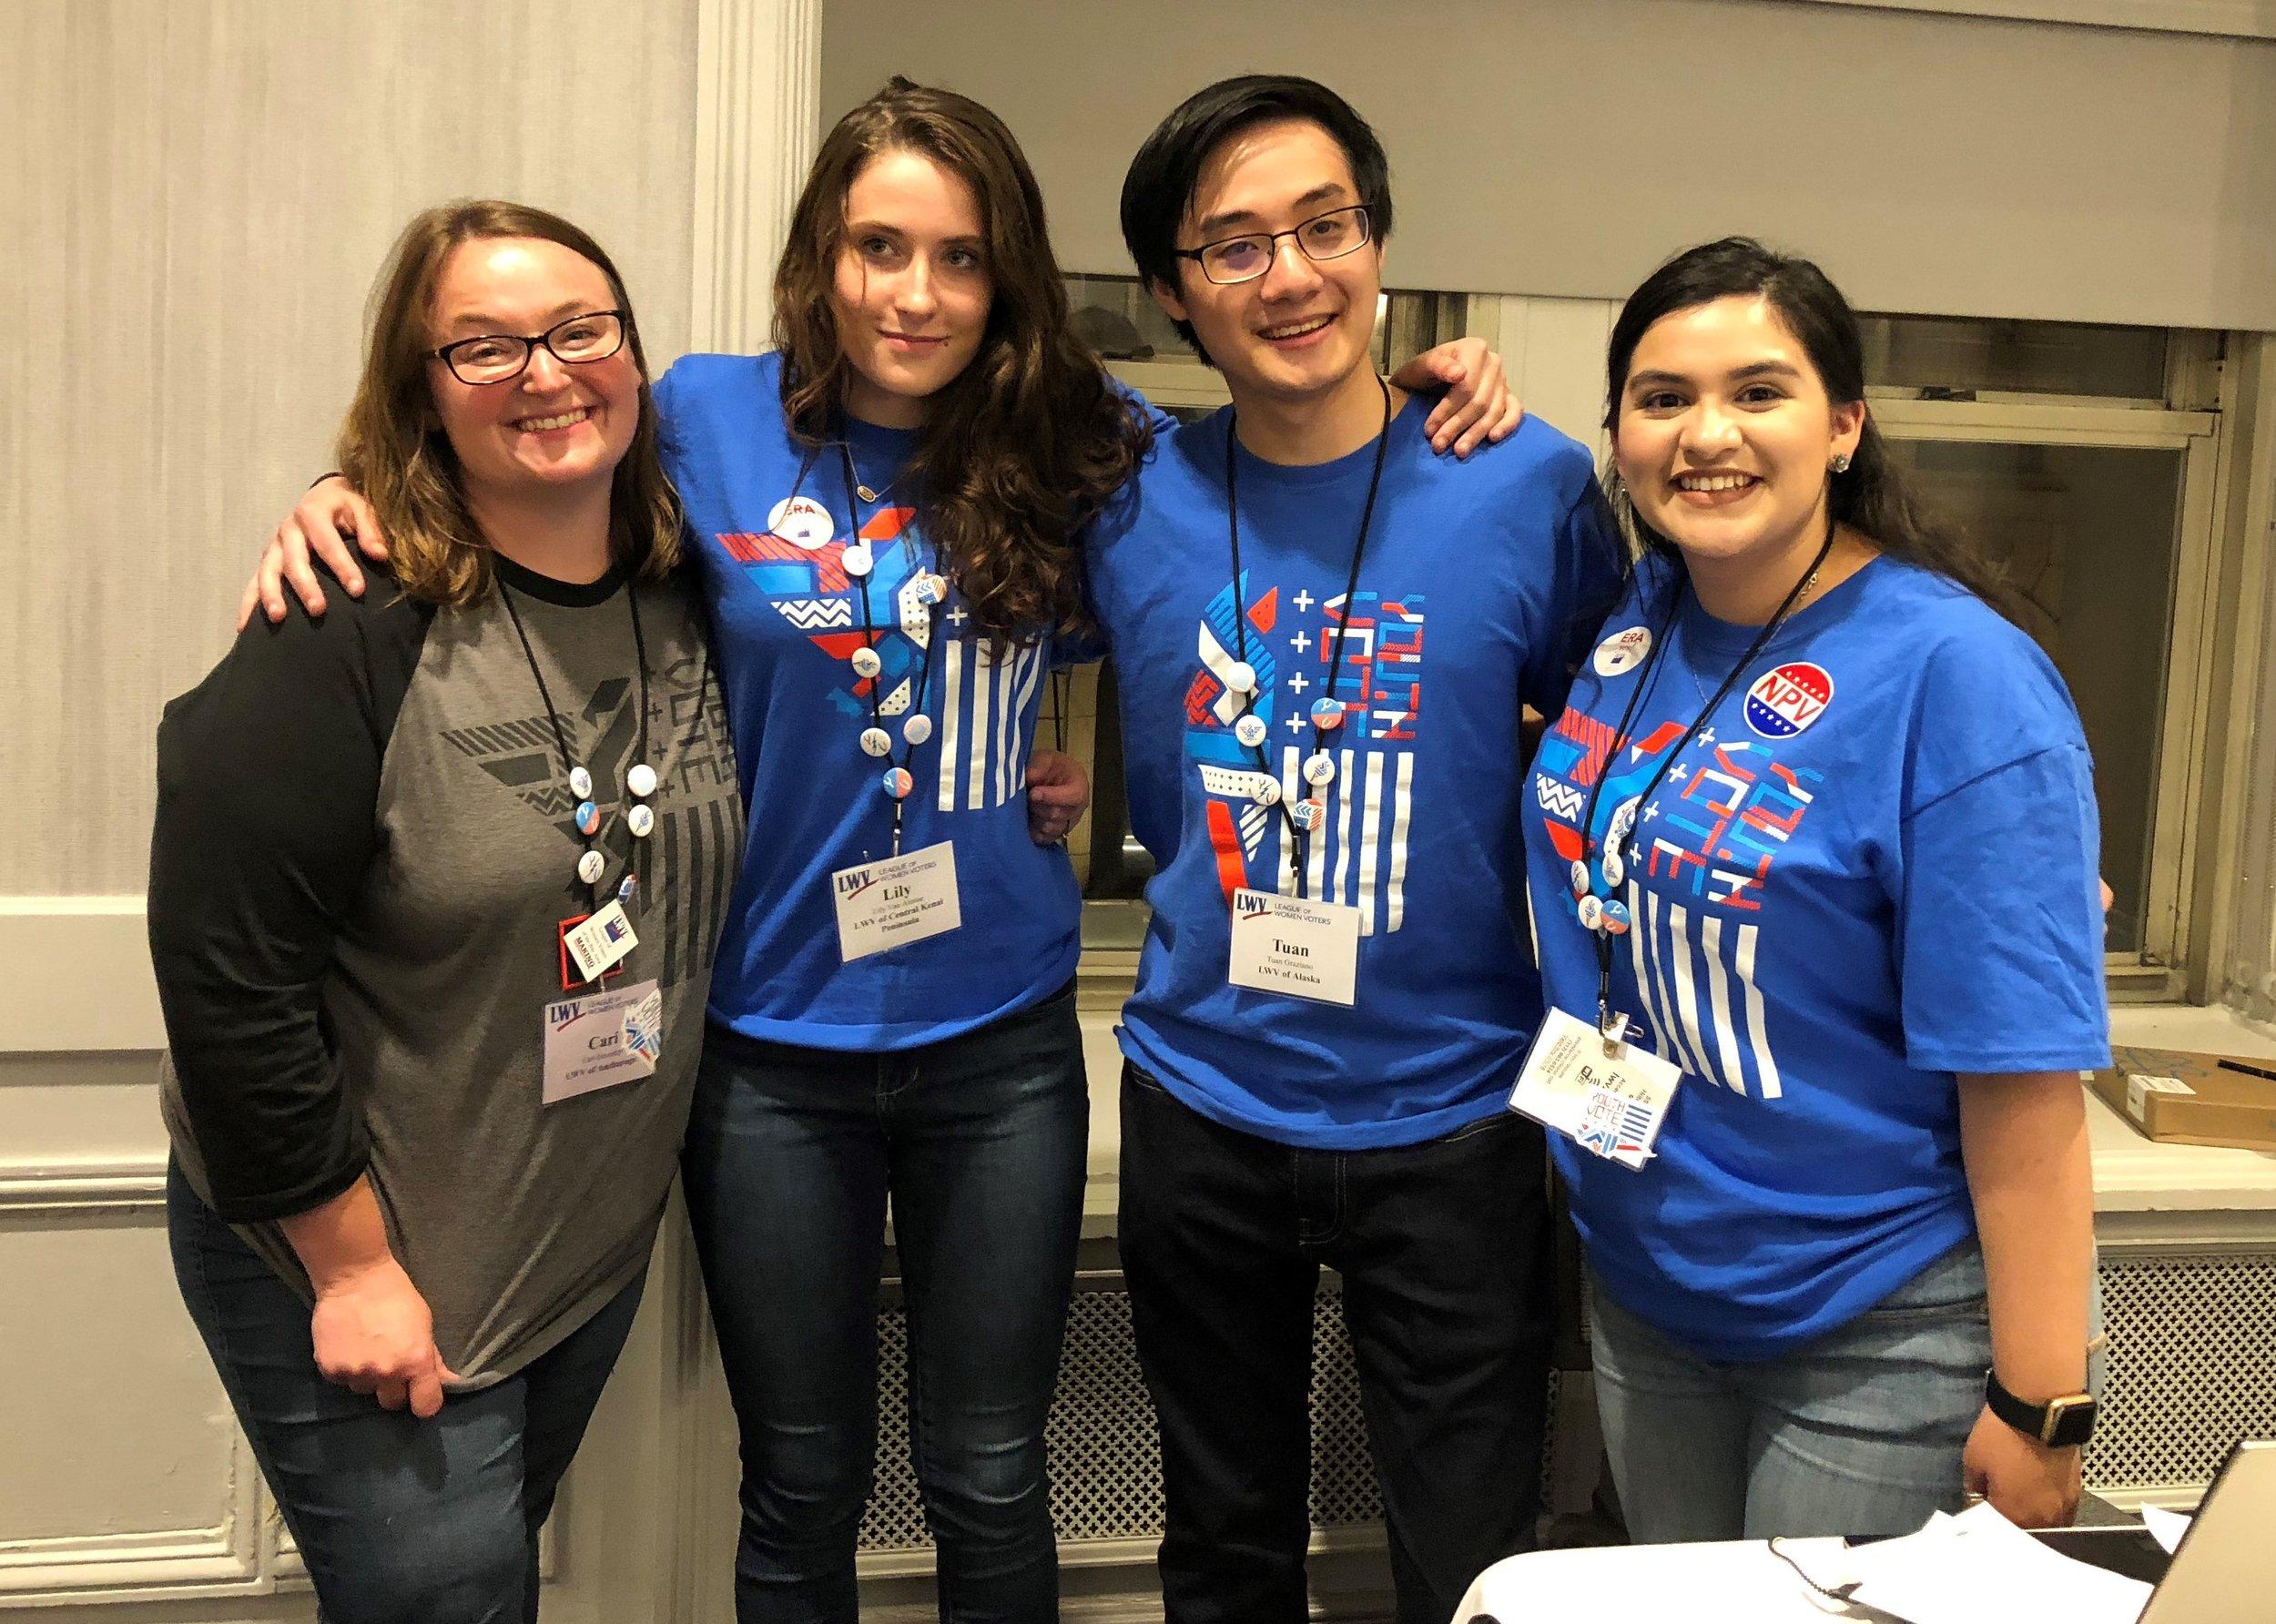 Alaska Youth T shirts.jpg